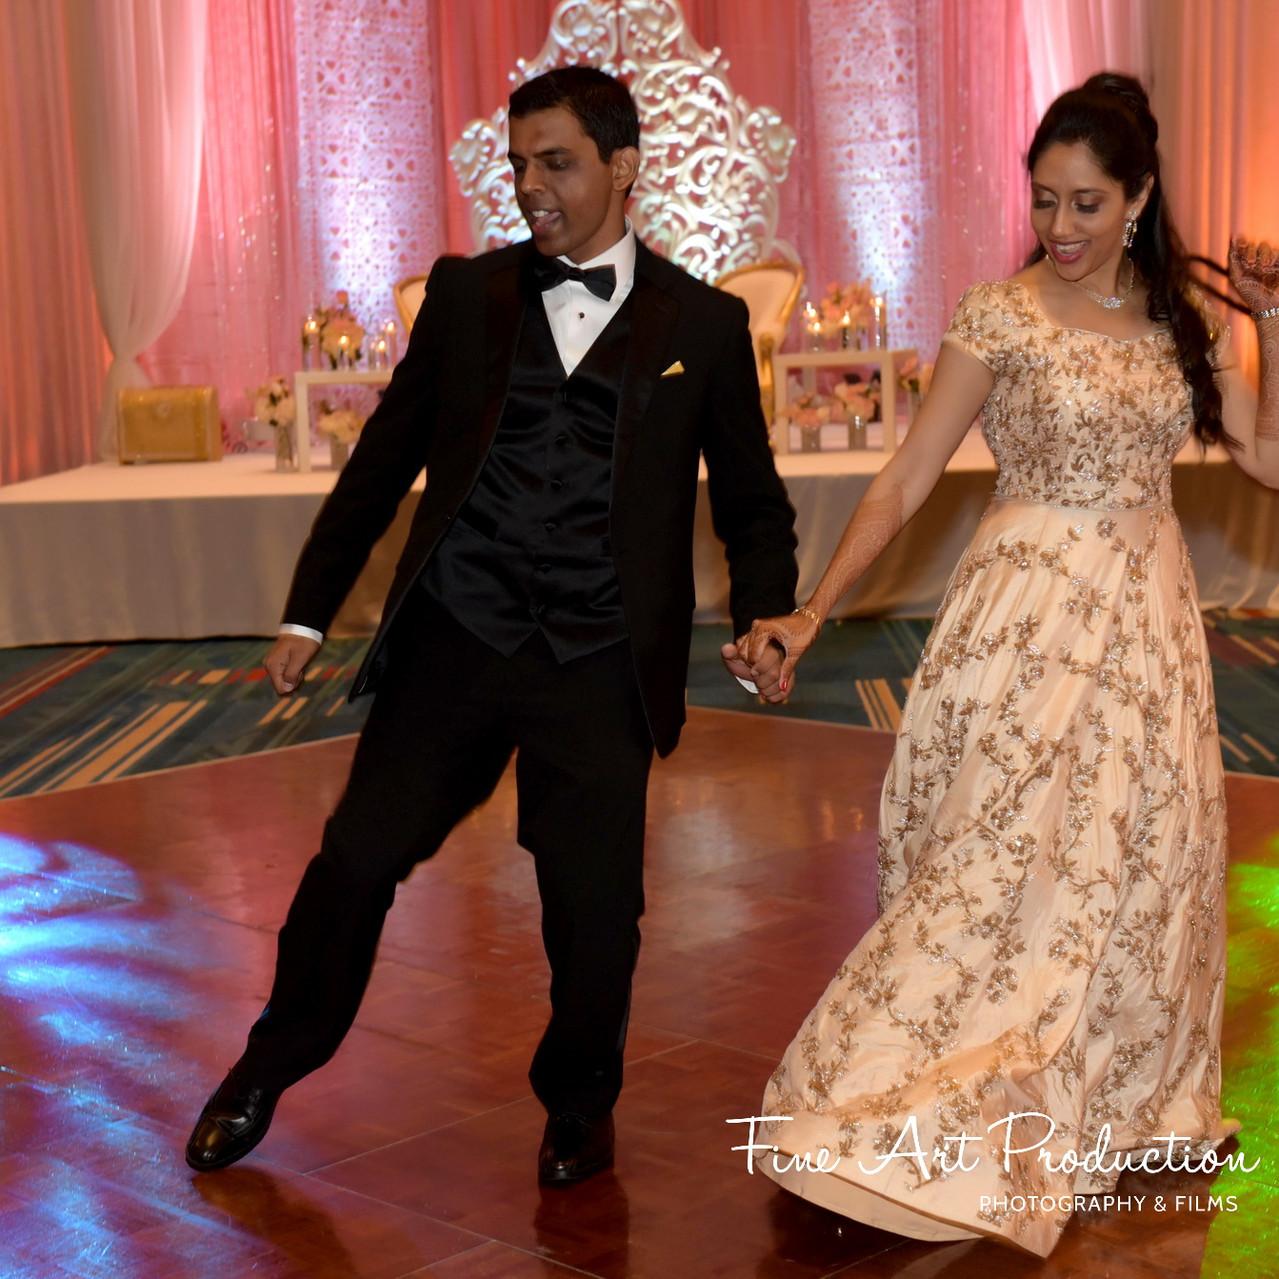 Hyatt-Regency-Grand-Cypress-Indian-Wedding-Reception-Photography-Fine-Art-Production-Amish-Thakkar_24